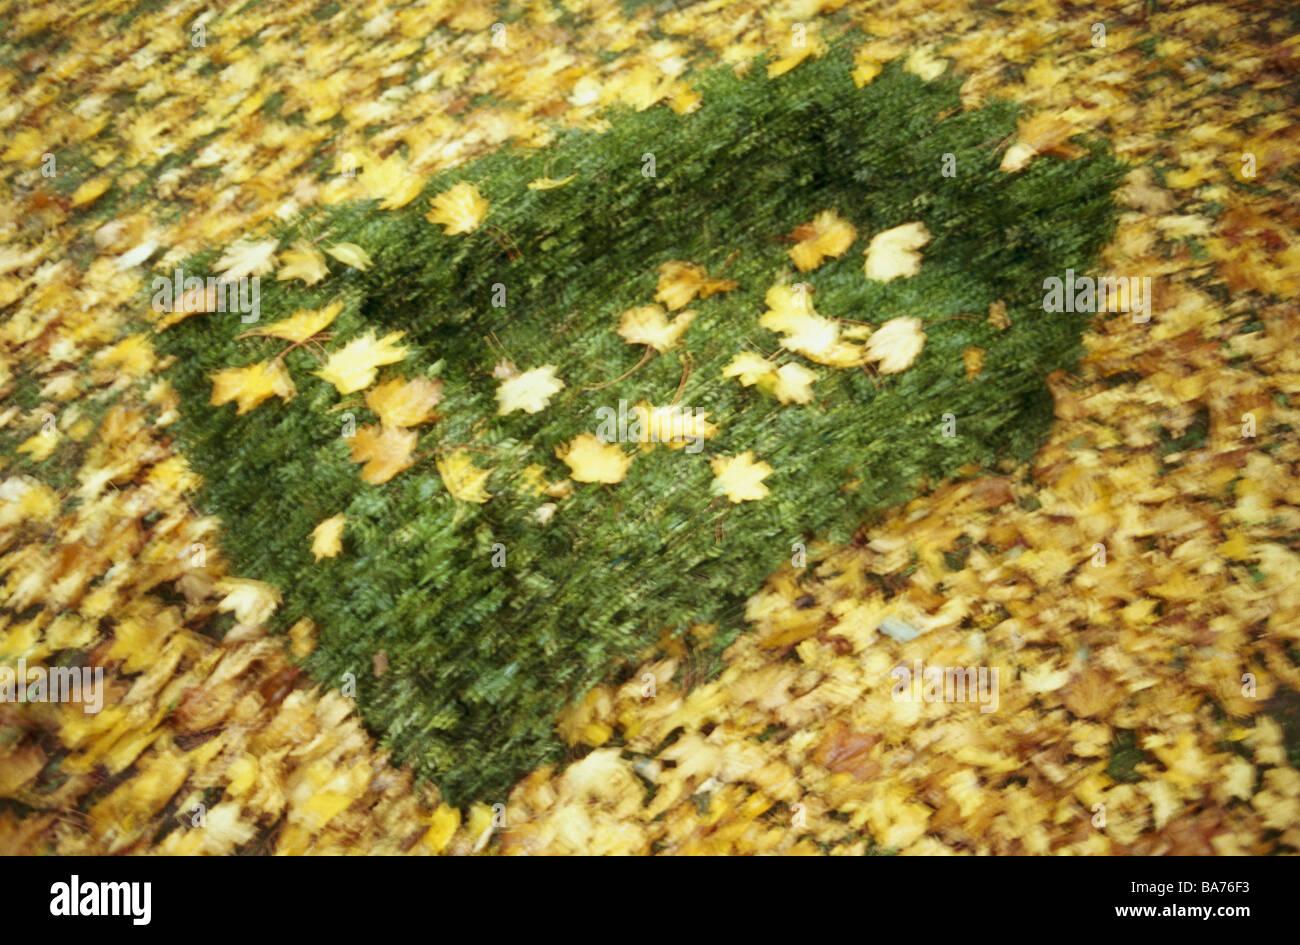 Park Bäume 'Bank' Buch Form geschnittene Kunst Herbst von oben Unschärfe Garten Natur Pflanzen Stockbild